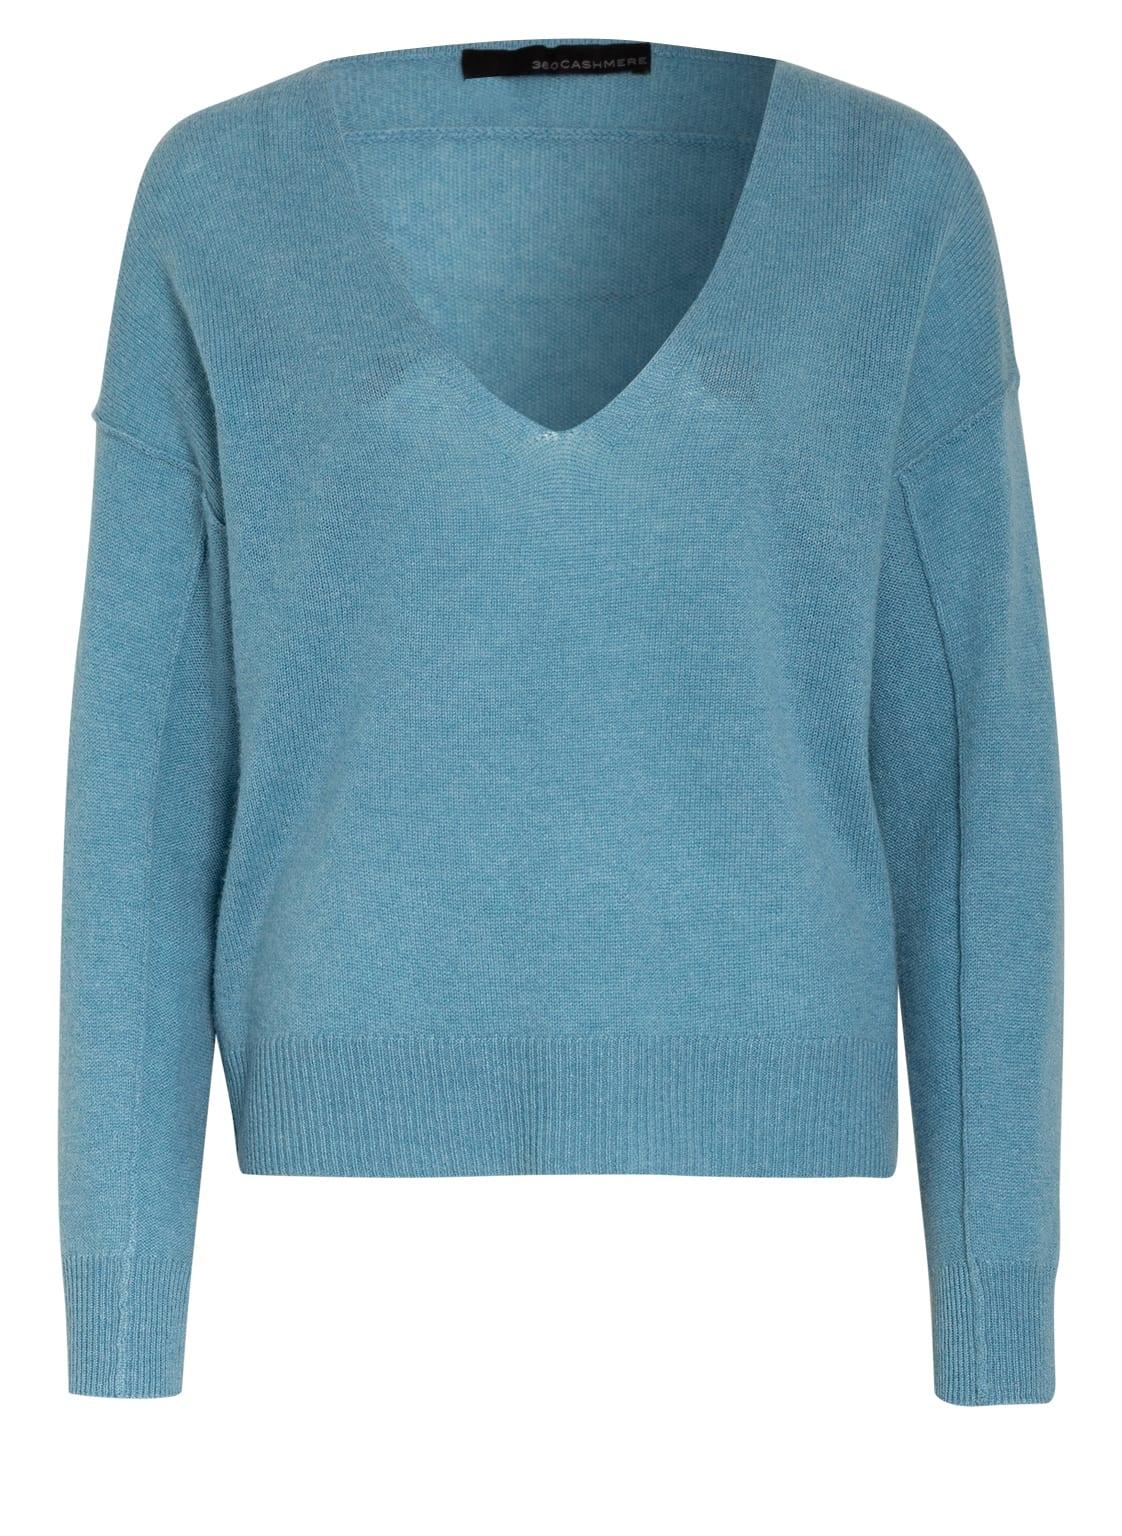 Image of 360cashmere Cashmere-Pullover blau